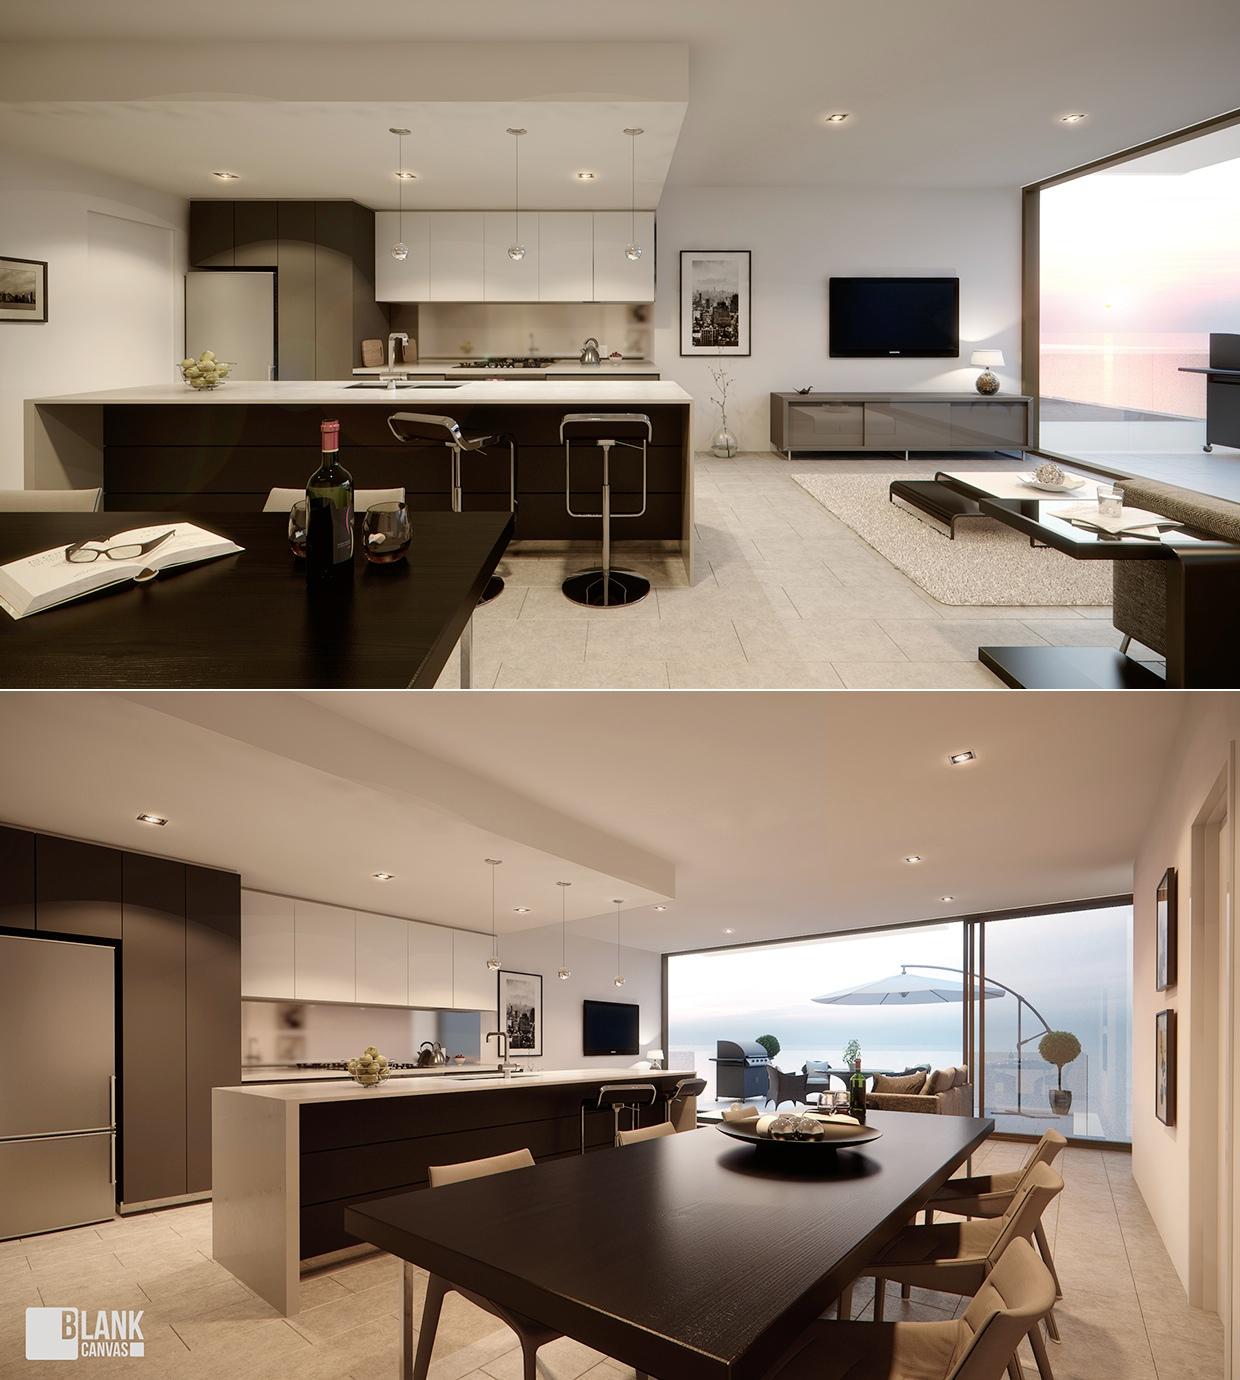 Интерьер дизайнерской квартиры-студии от Blank Canvas